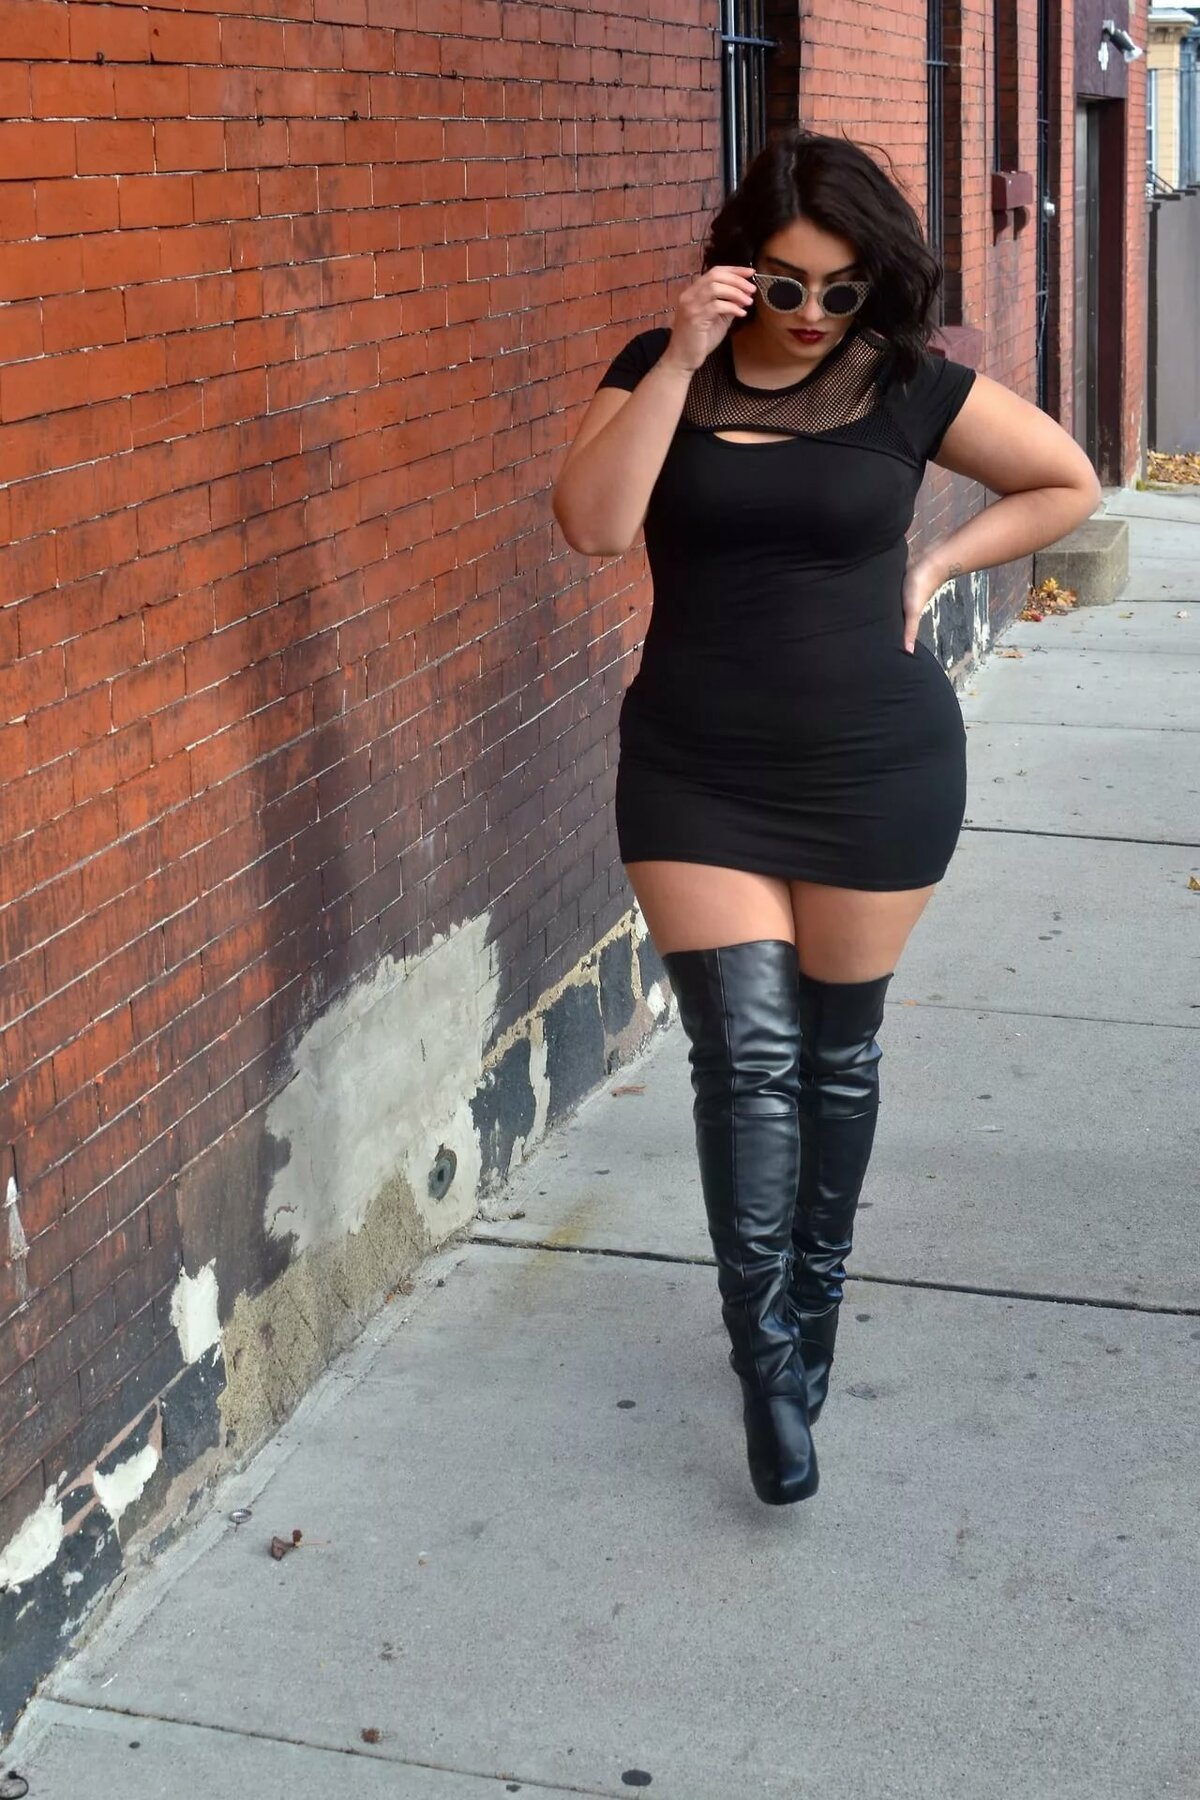 Chubby girls in high heels — img 8